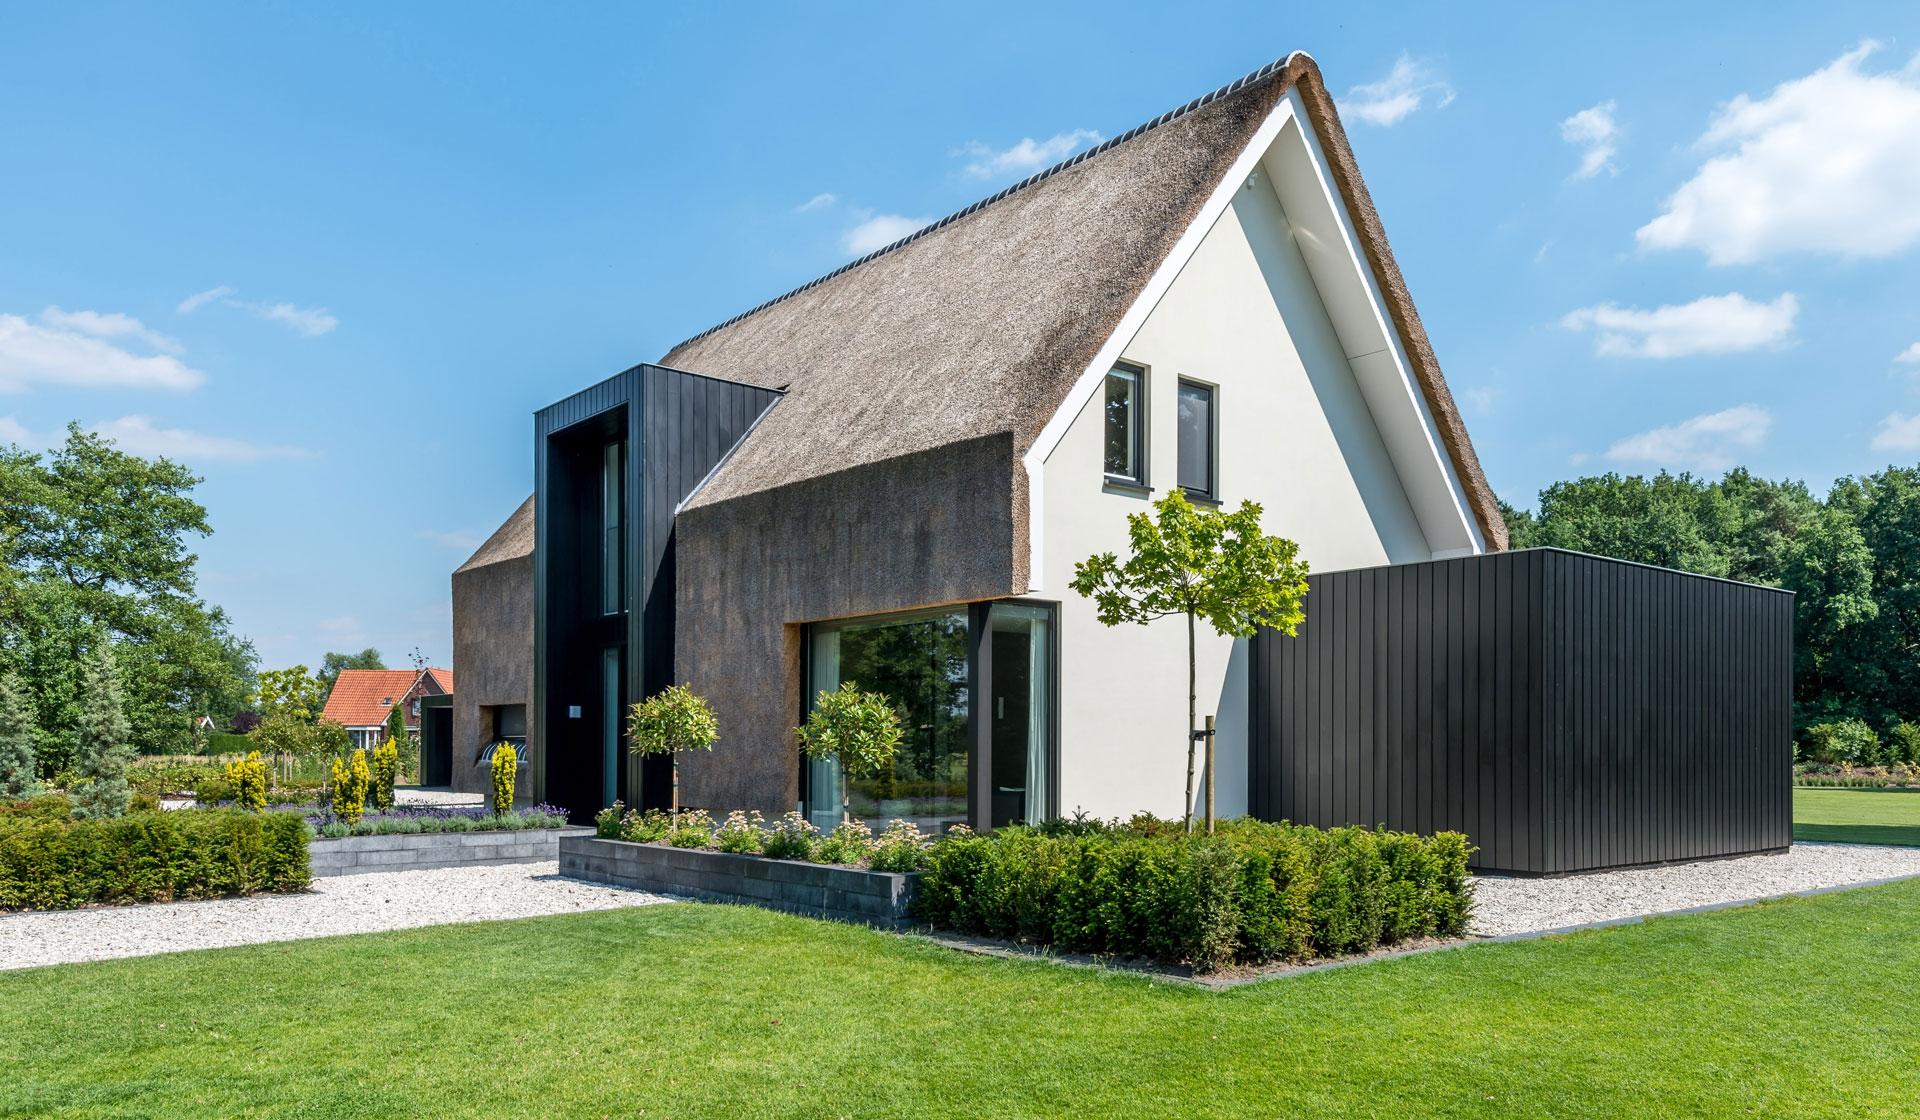 Nieuwbouw - Het Fundament Architectuur